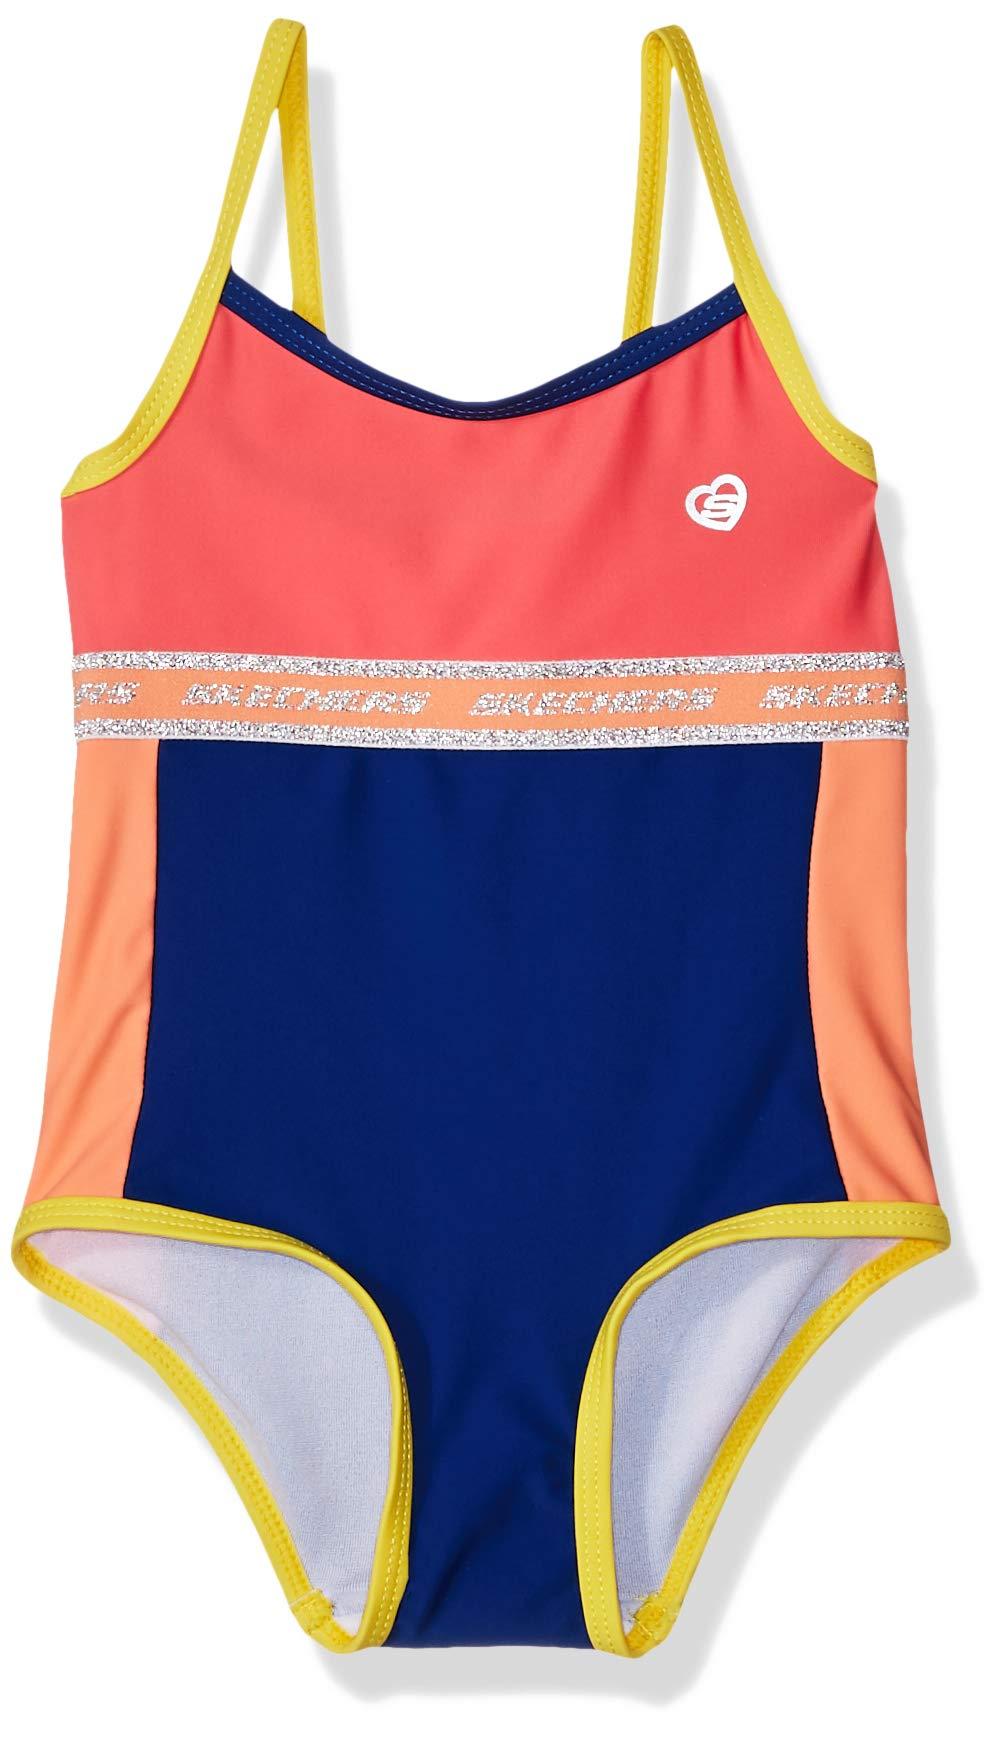 Skechers Girls' Baby 1-Piece Swim Suit Bathingsuit